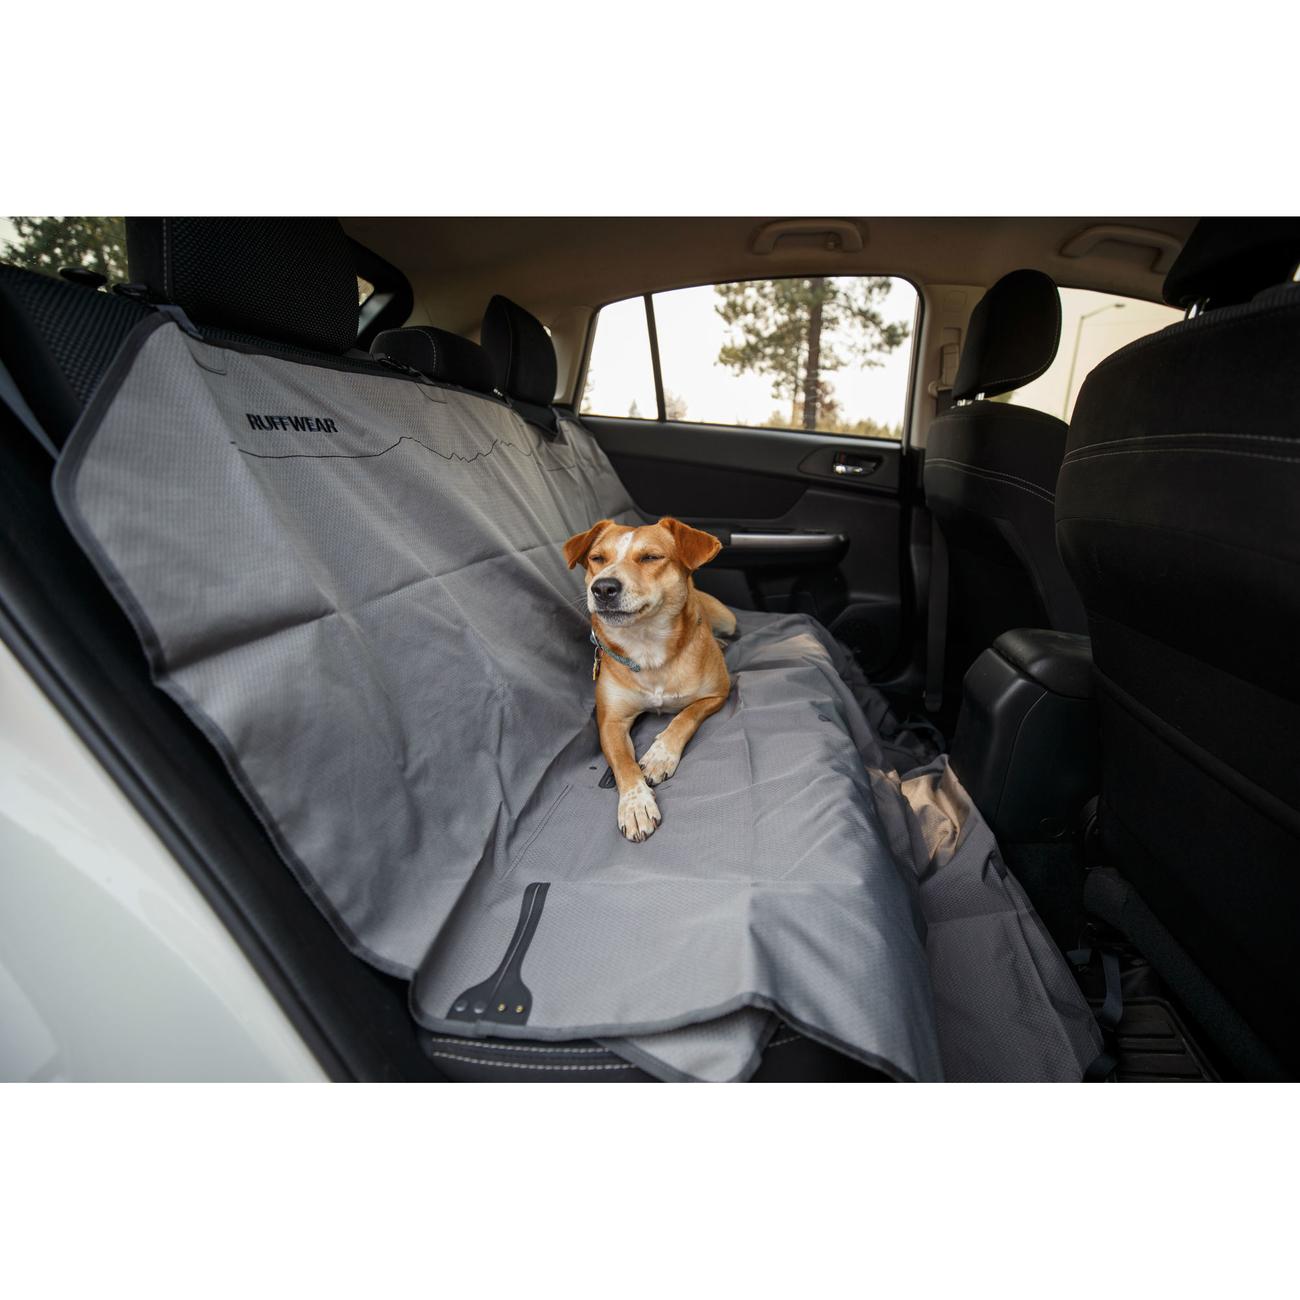 Ruffwear Dirtbag Seat Cover Autoschutzdecke, Bild 16